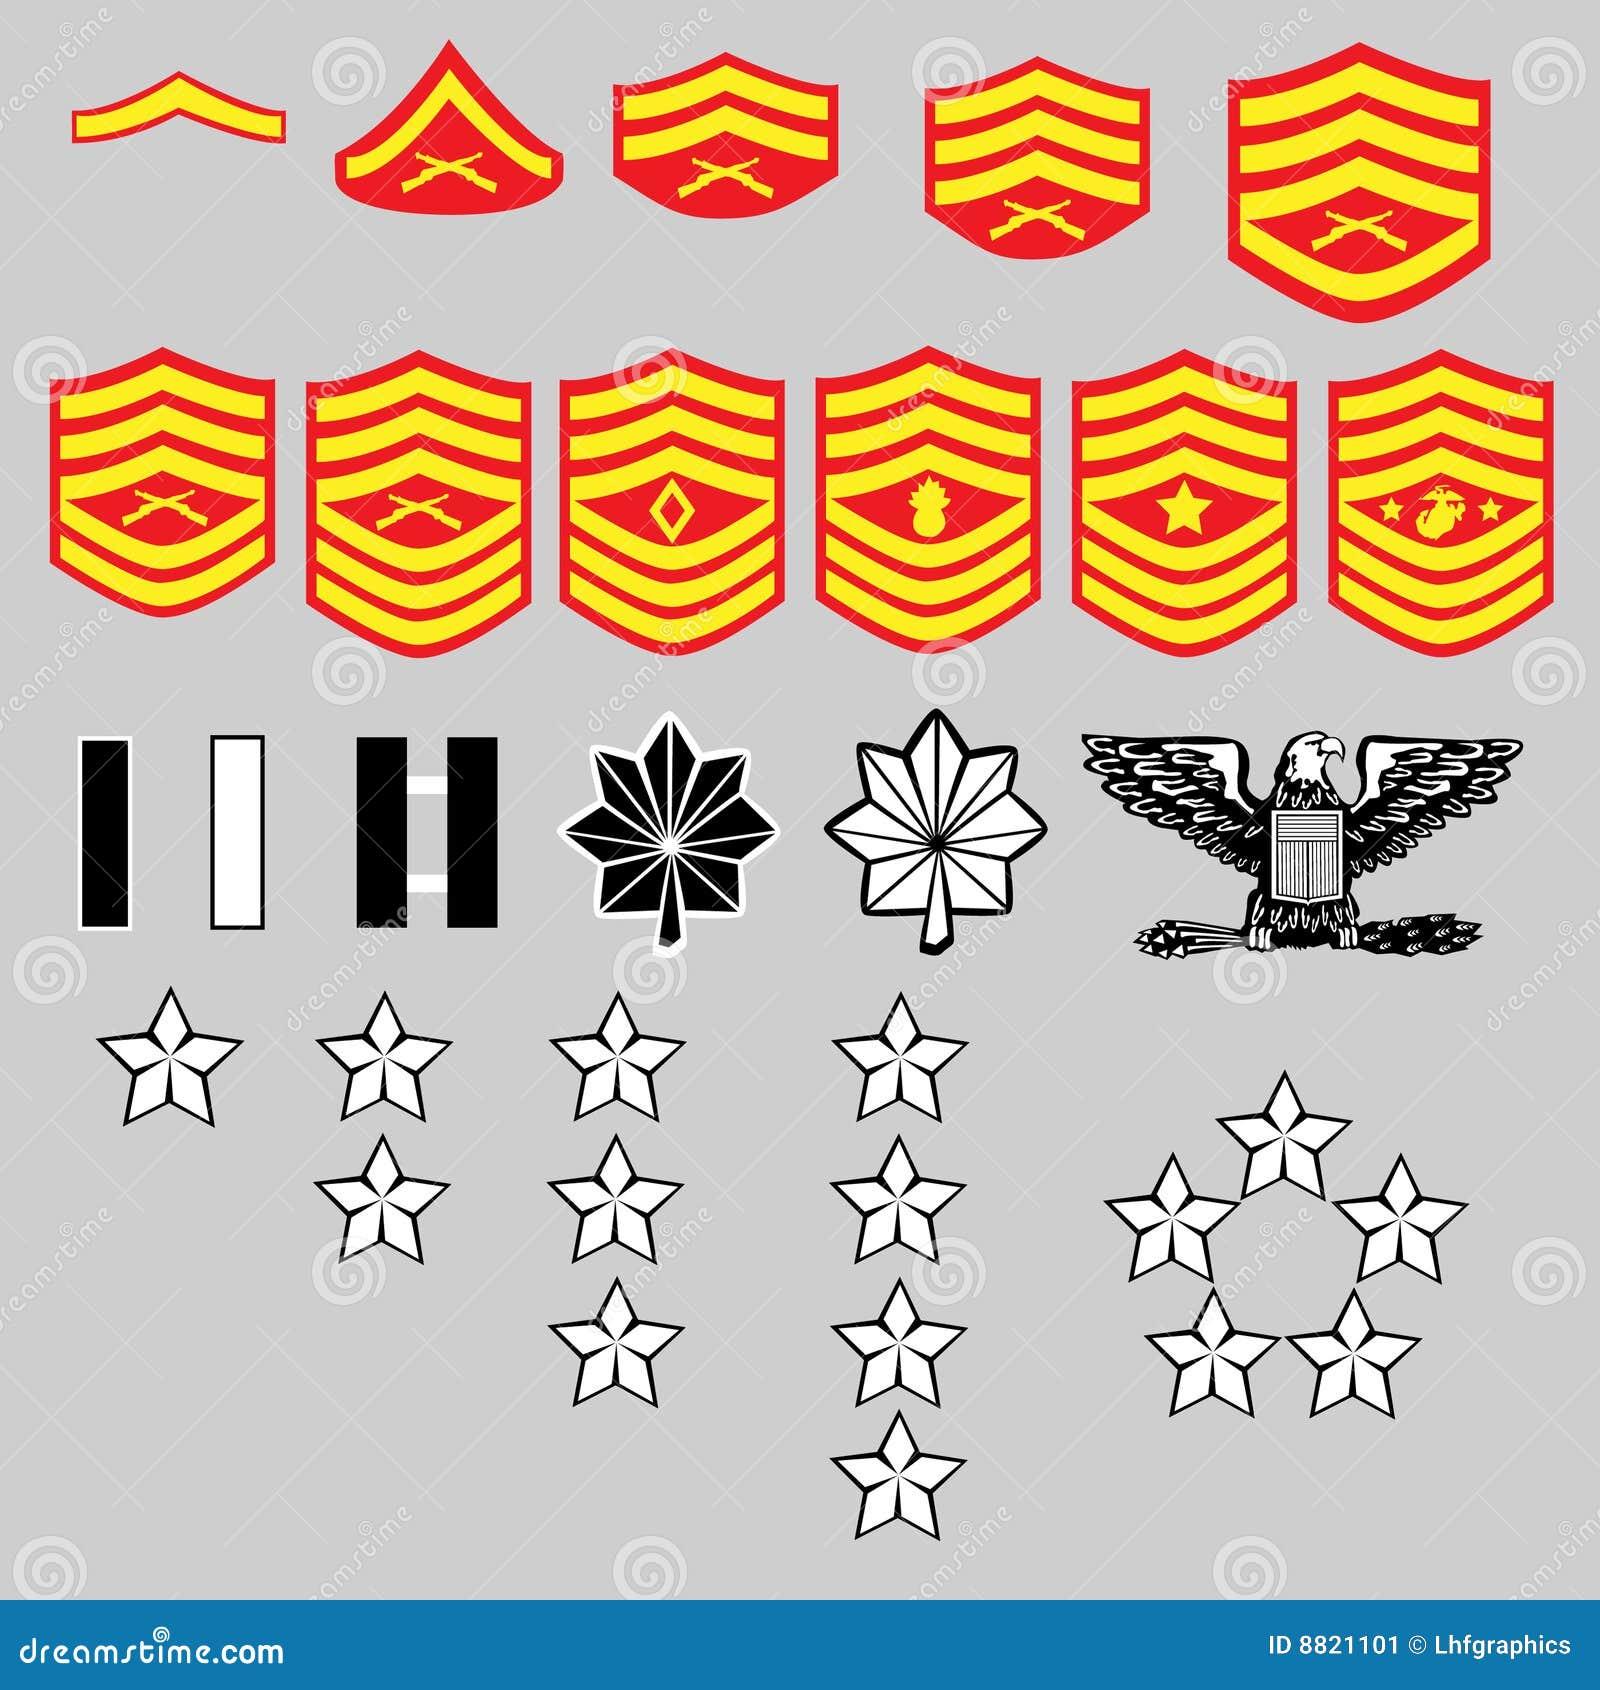 Us marine corps insignia stock vector illustration of medal 24173533 us marine corp rank insignia stock image buycottarizona Image collections